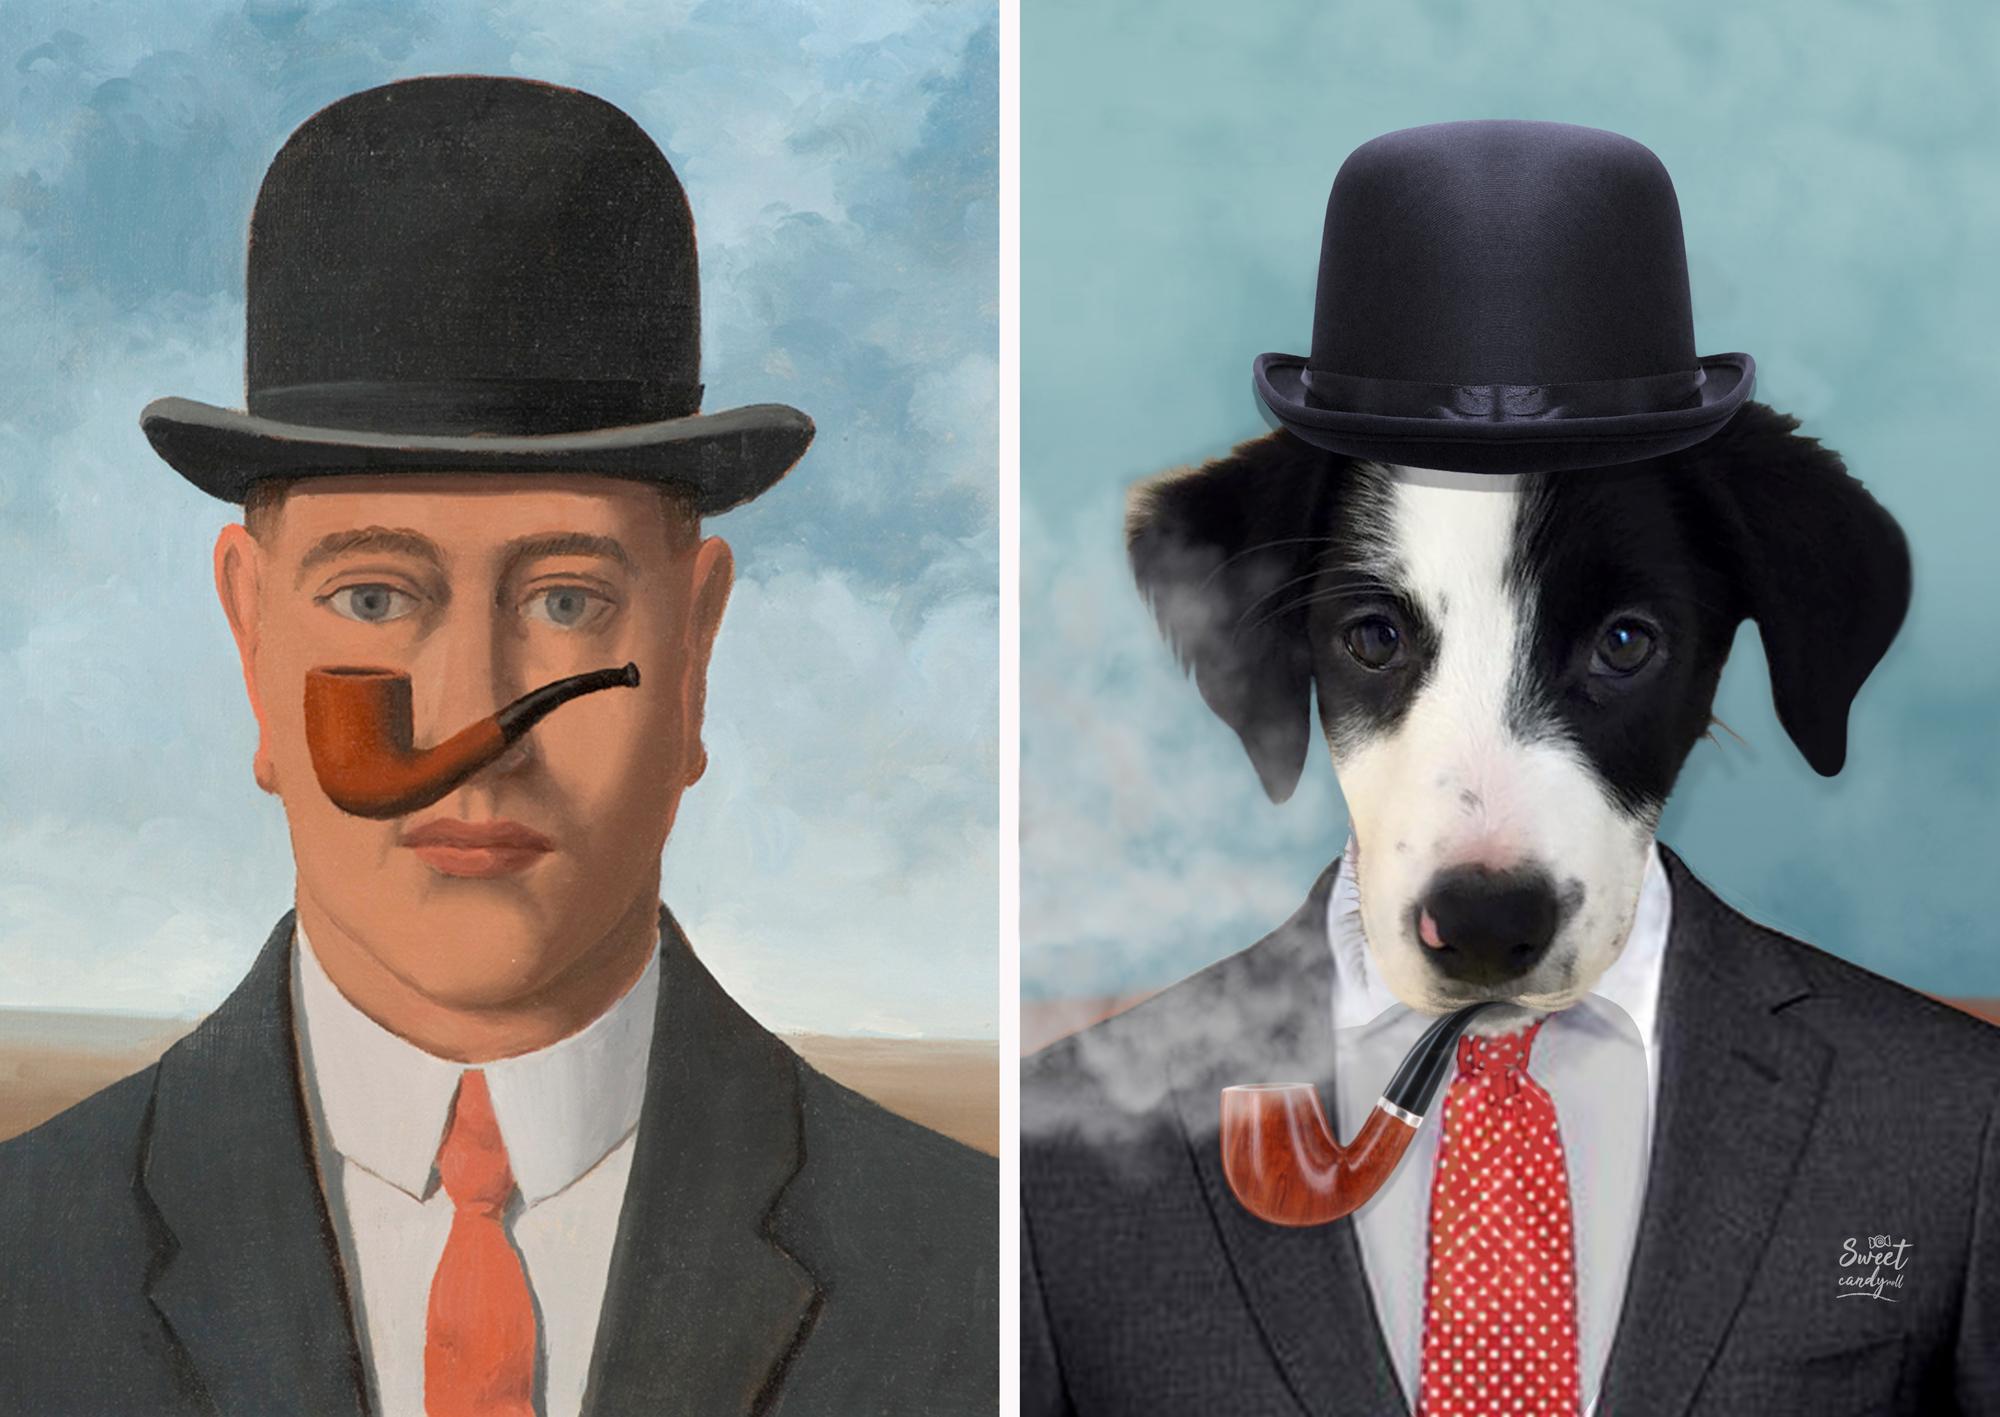 La-buona-fede-magritte-dog